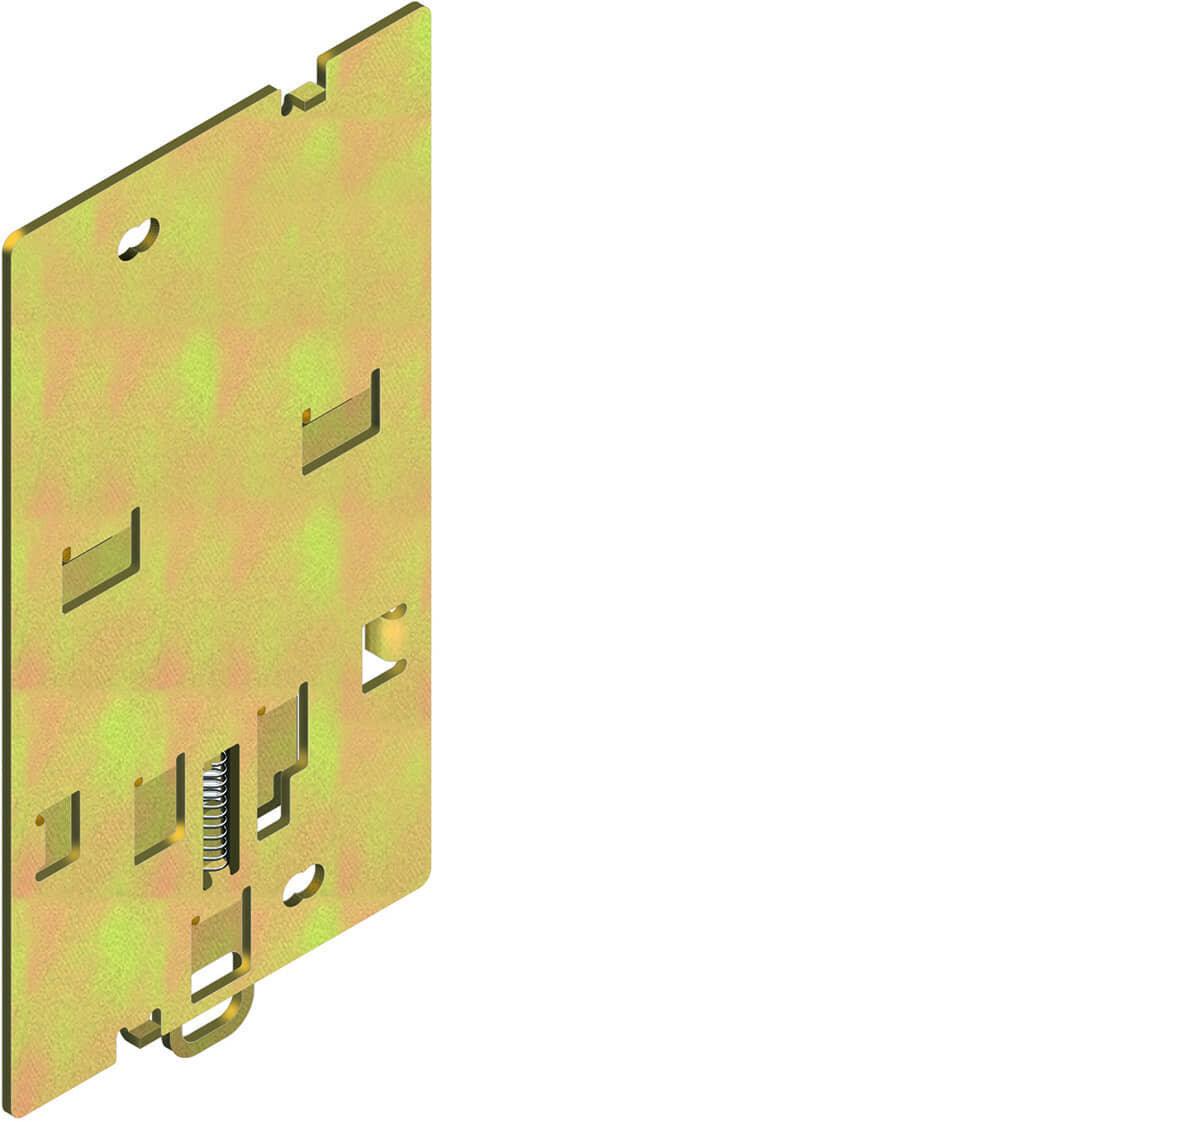 1SDA051439R1 ABB SACE Tmax DIN 50022 Rail Mount Adaptor For T3